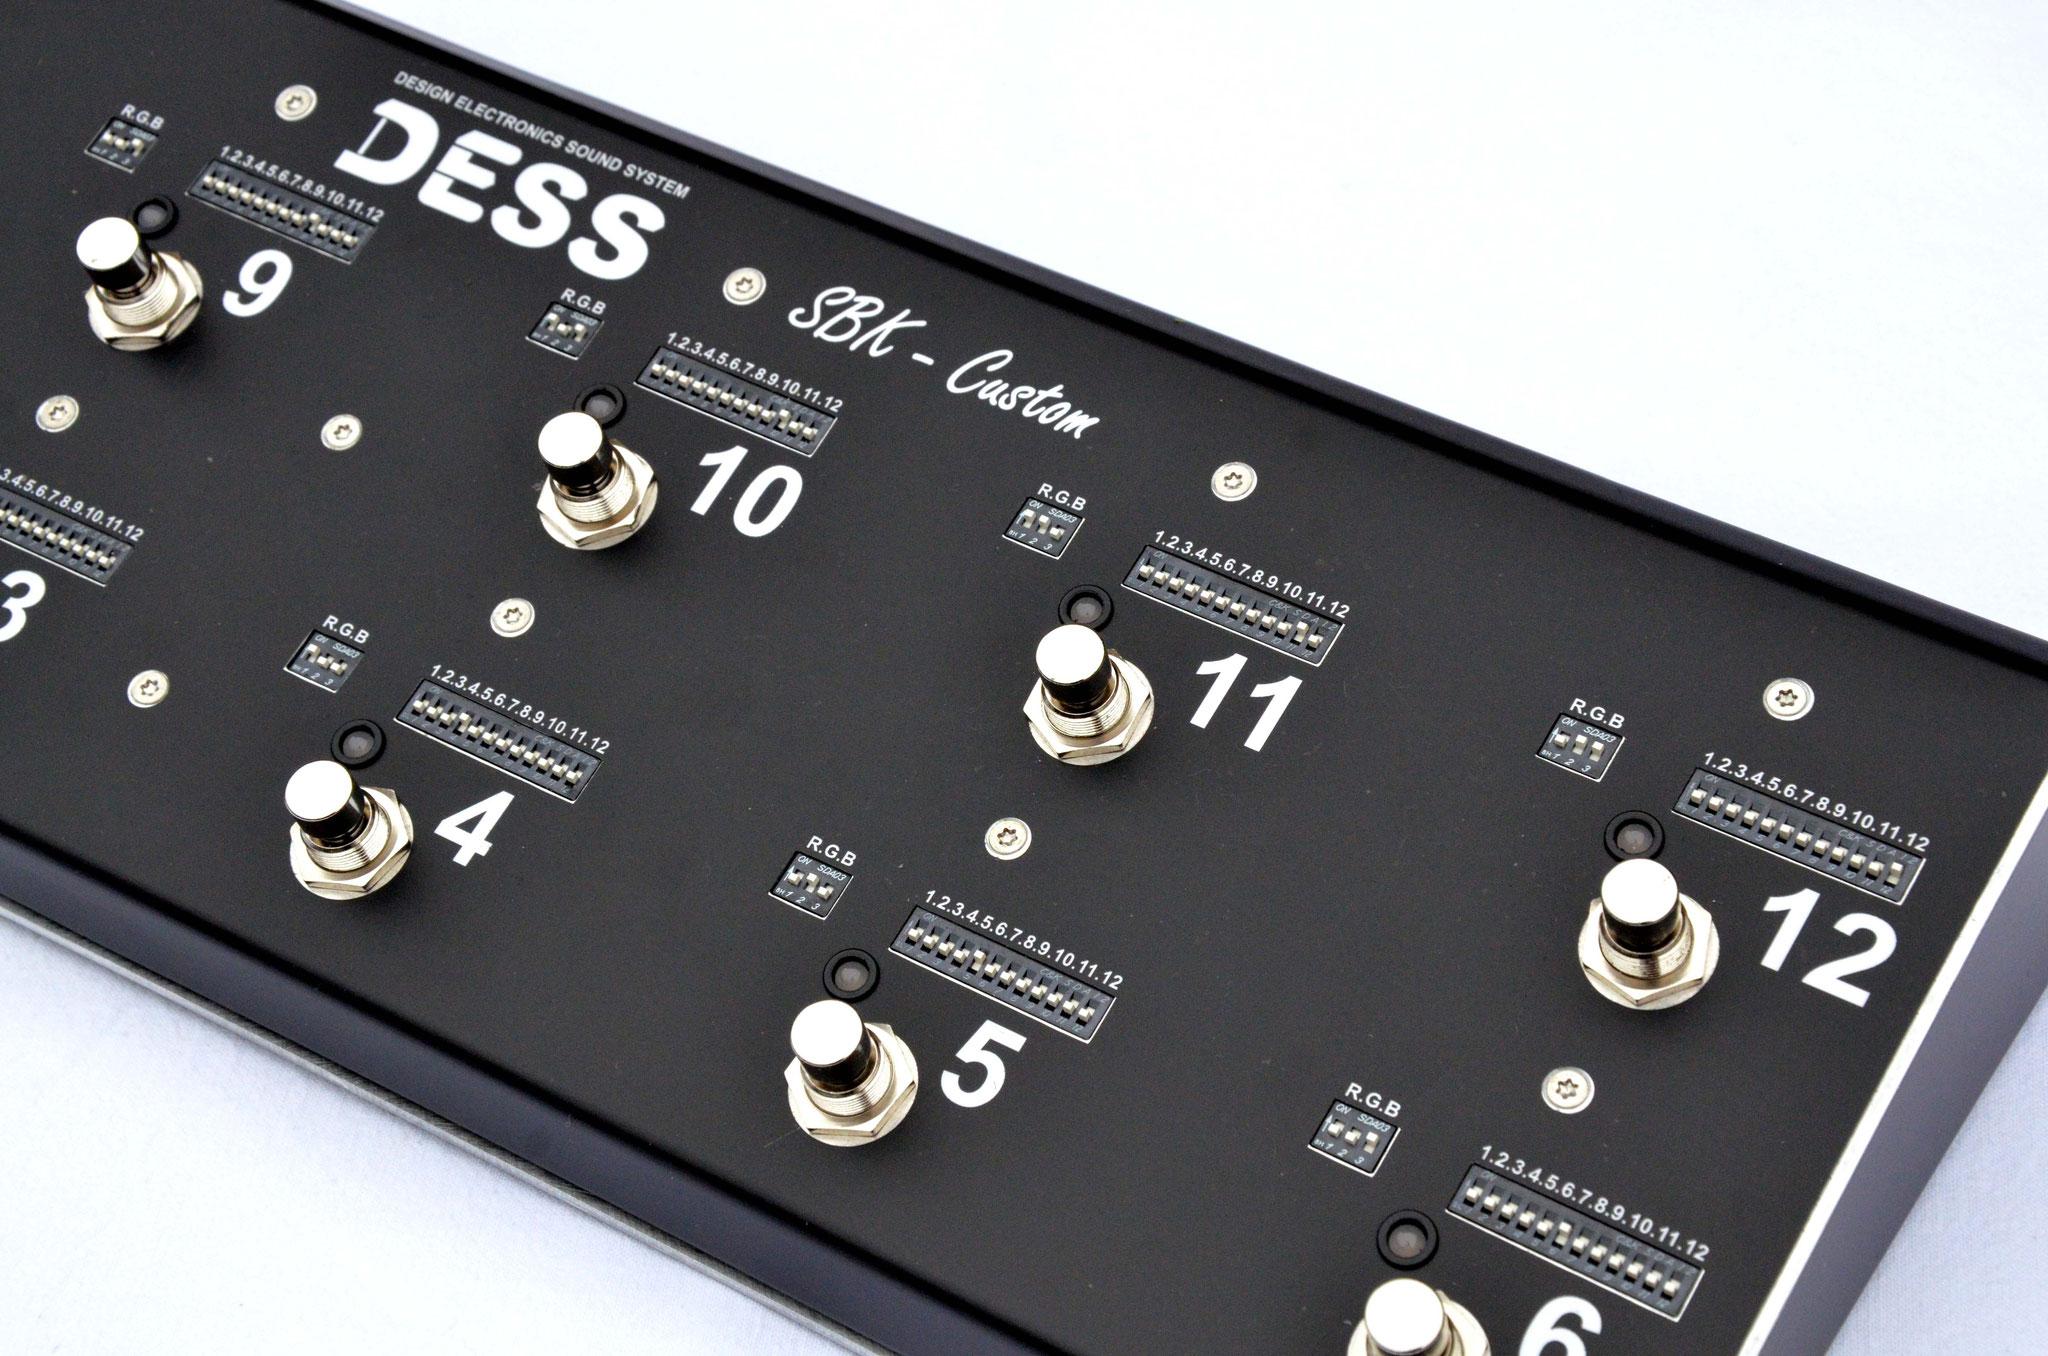 DESS, custom shop, custom switch, switcher, analogique, buffer, tuner, SBK Custom